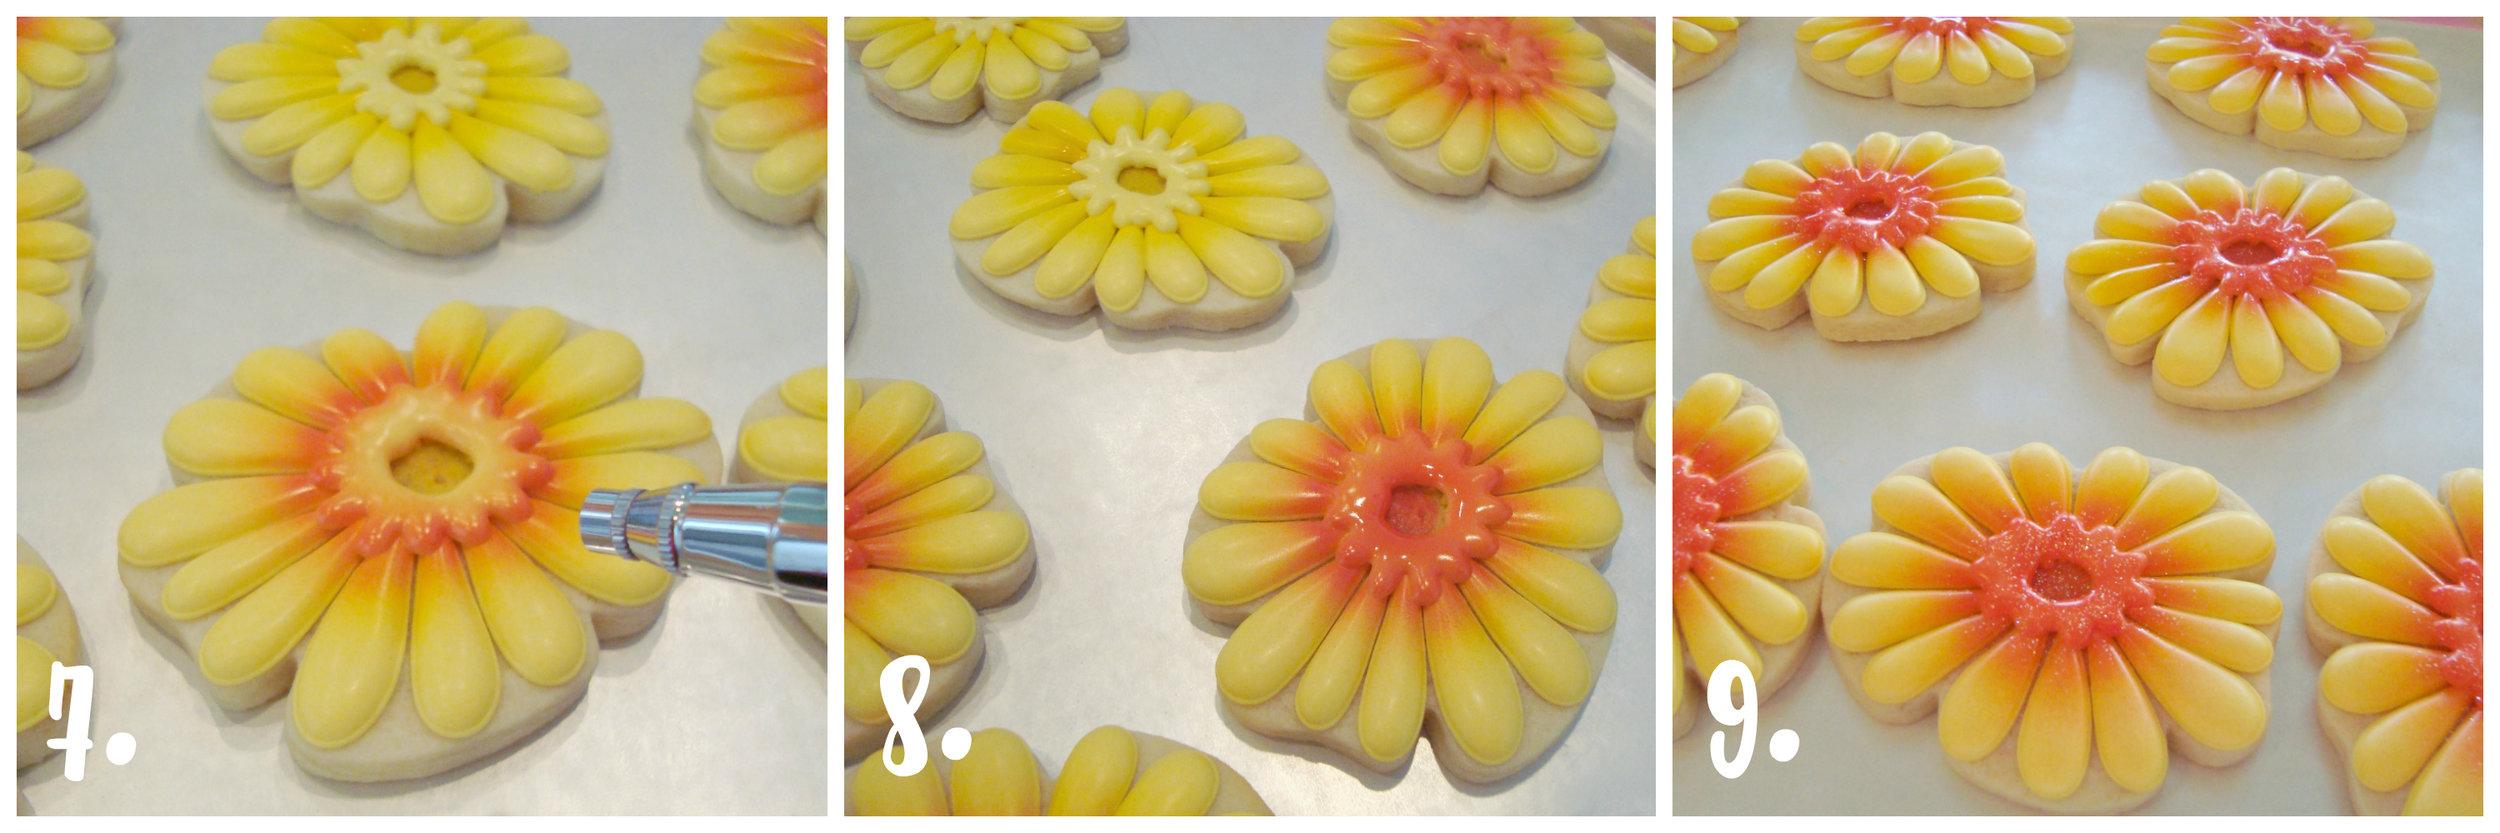 blyss daisies 4.jpg